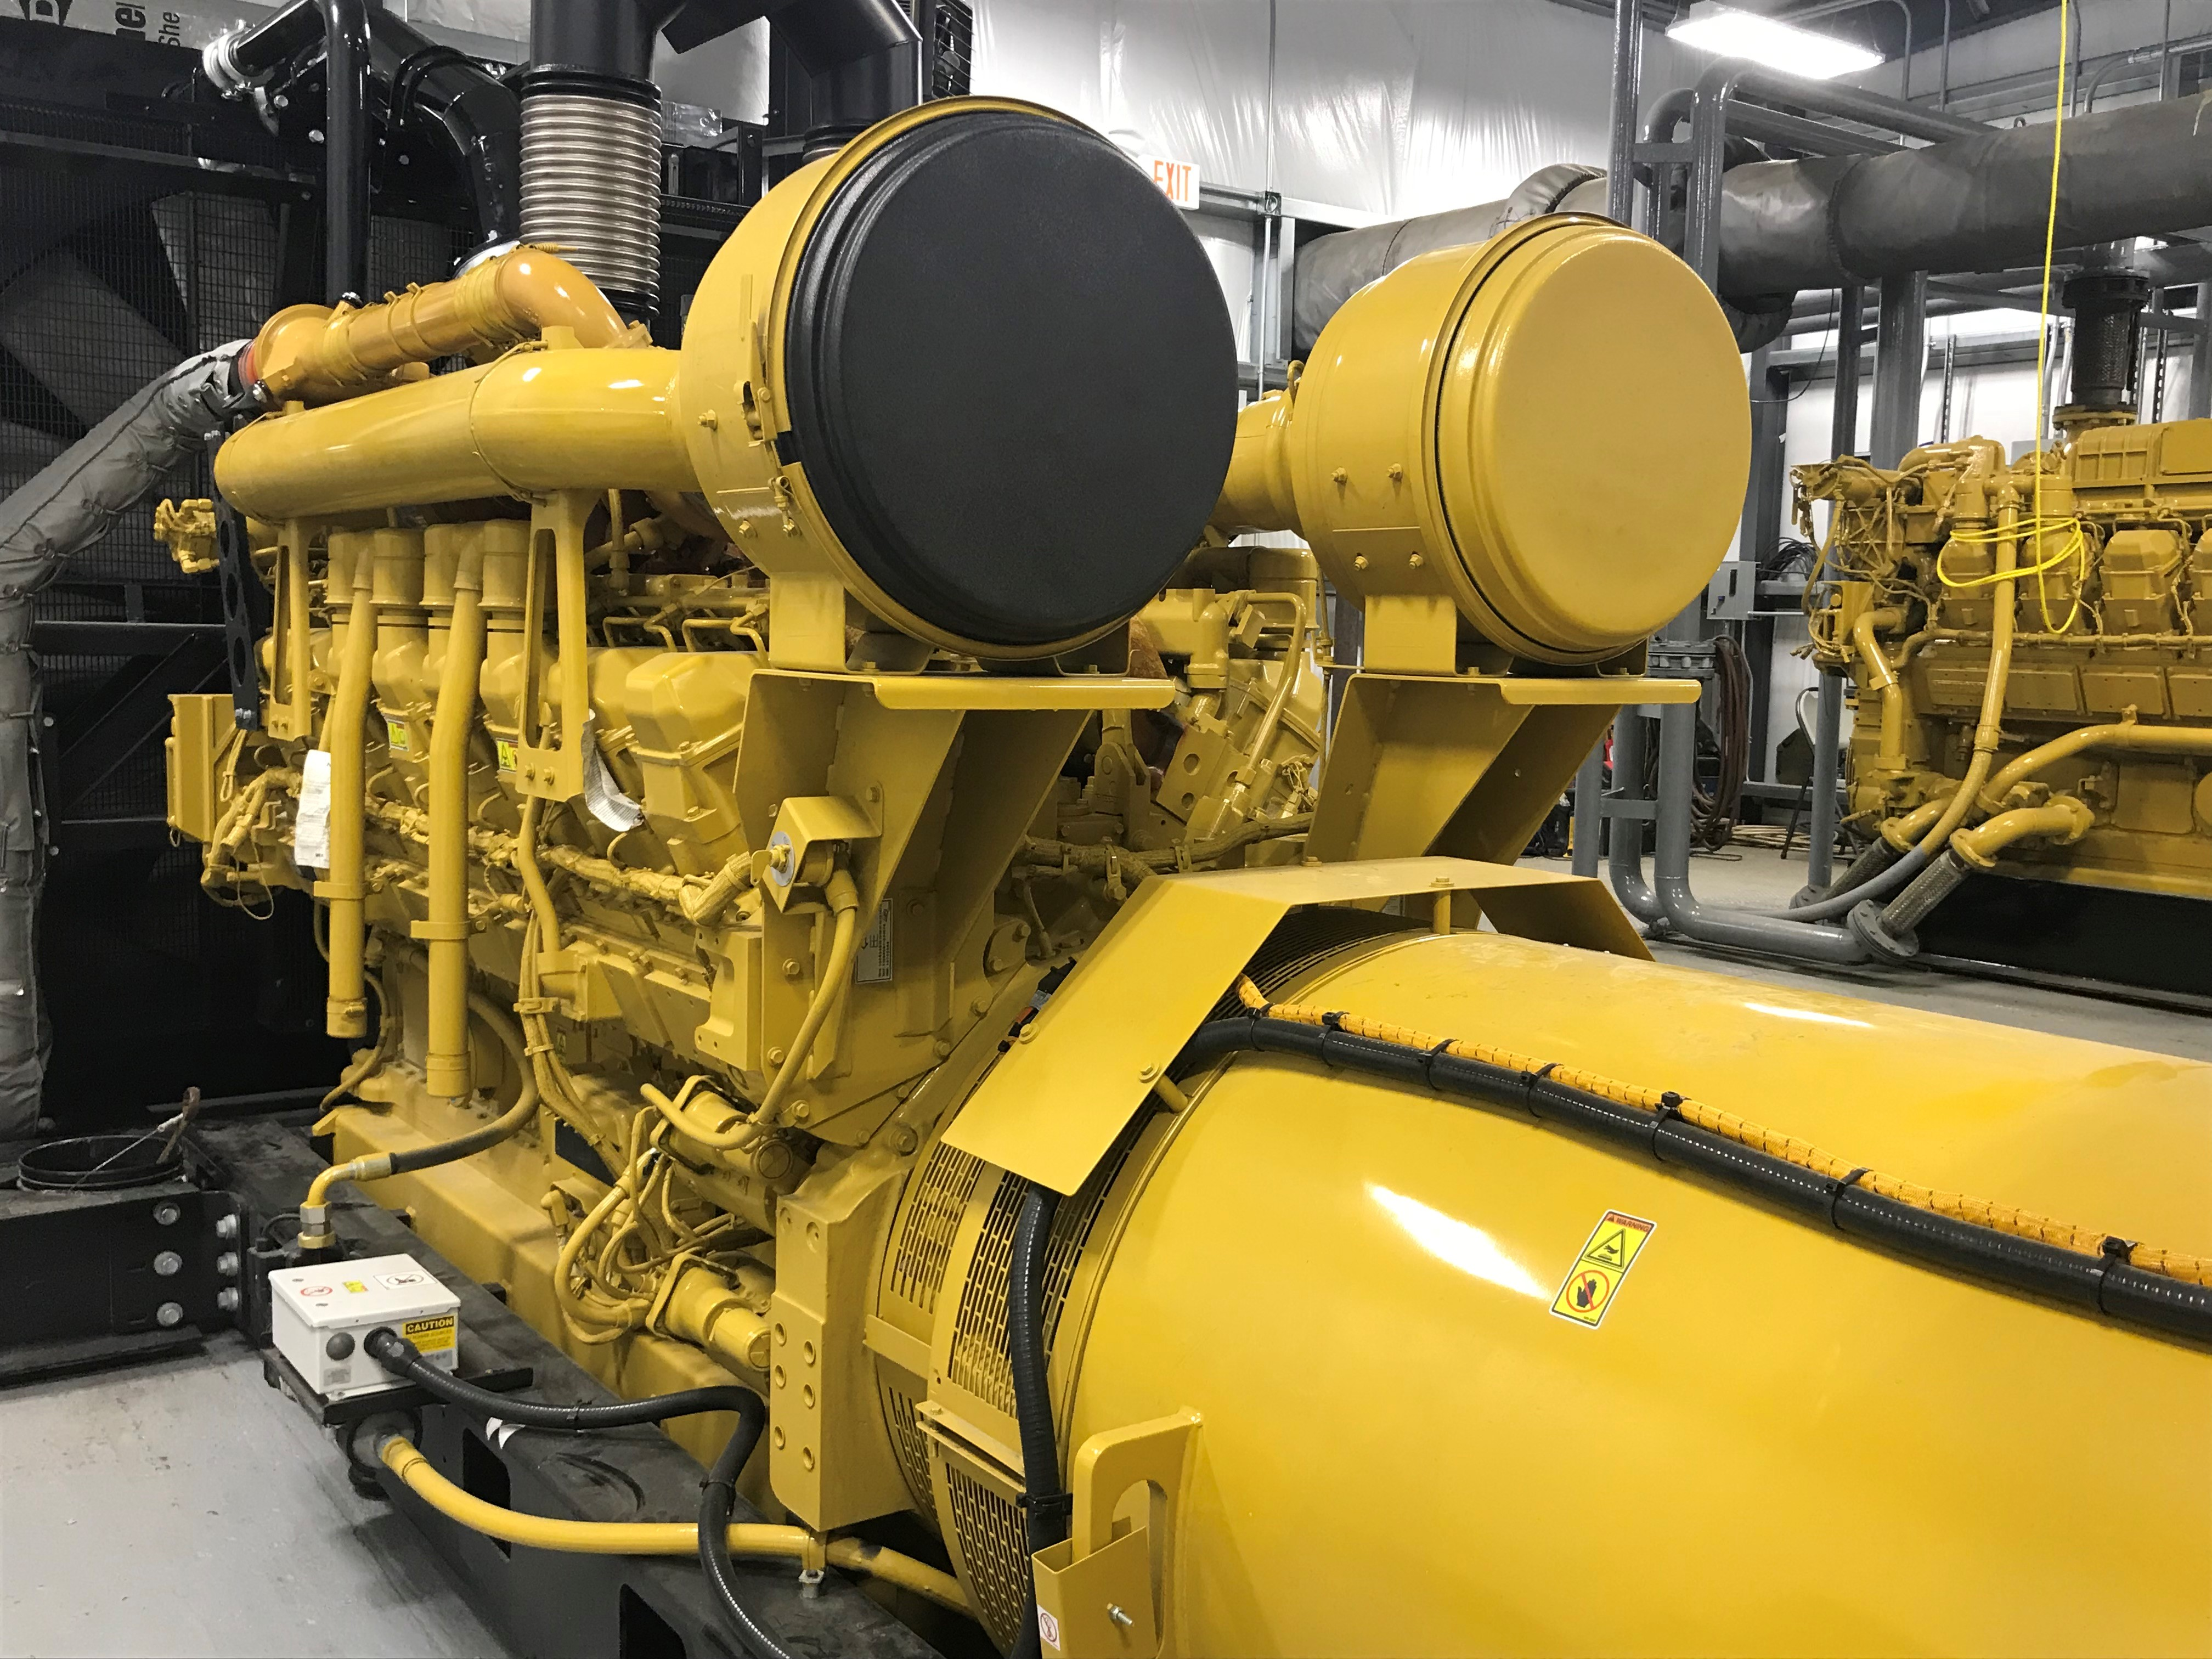 BIPCo Generators and Fuel Resources